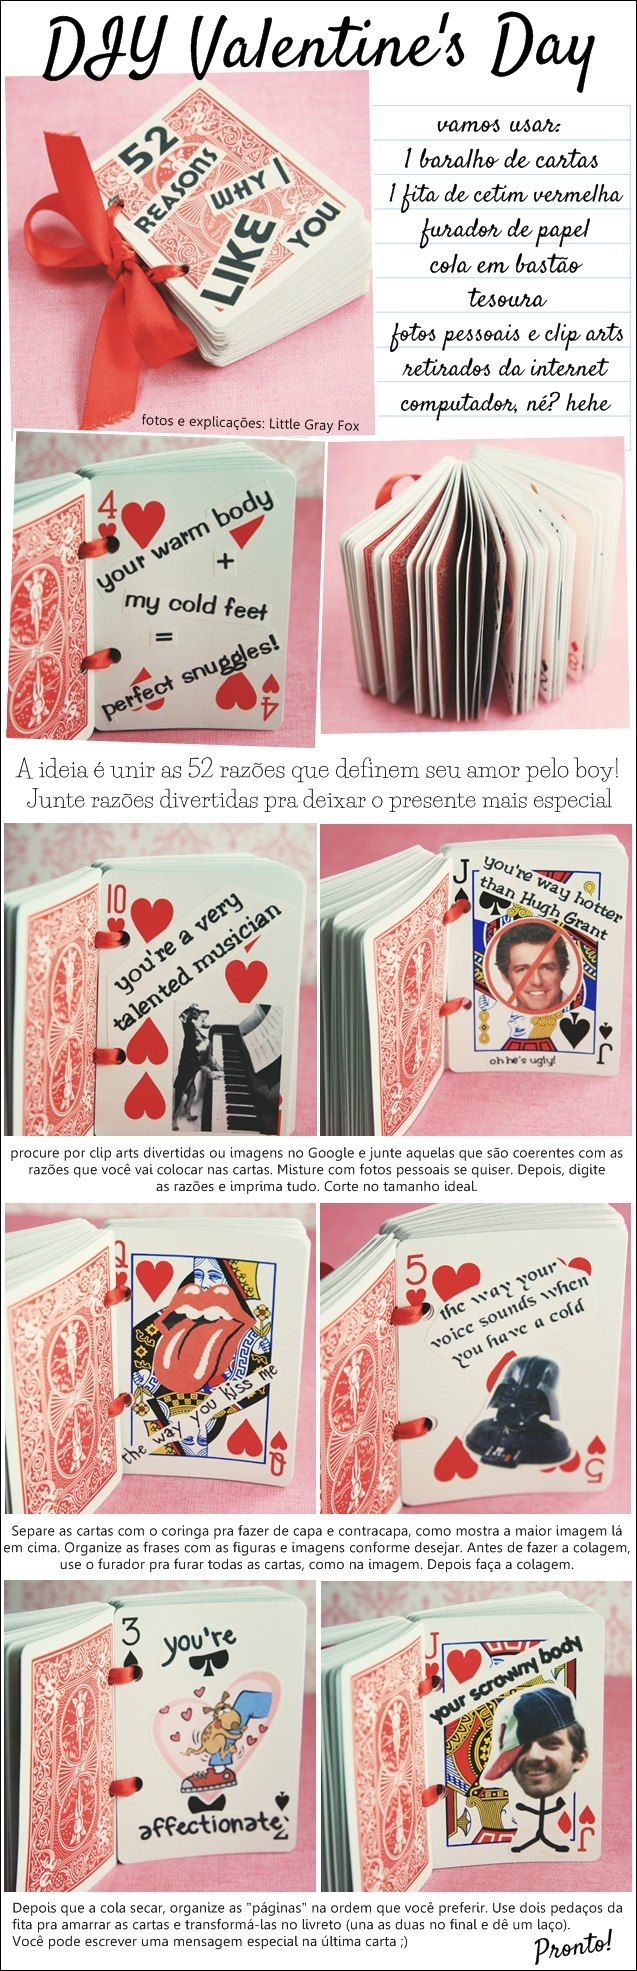 mundo-lolita-valentines-day-presente-diy-cartas-52-razões